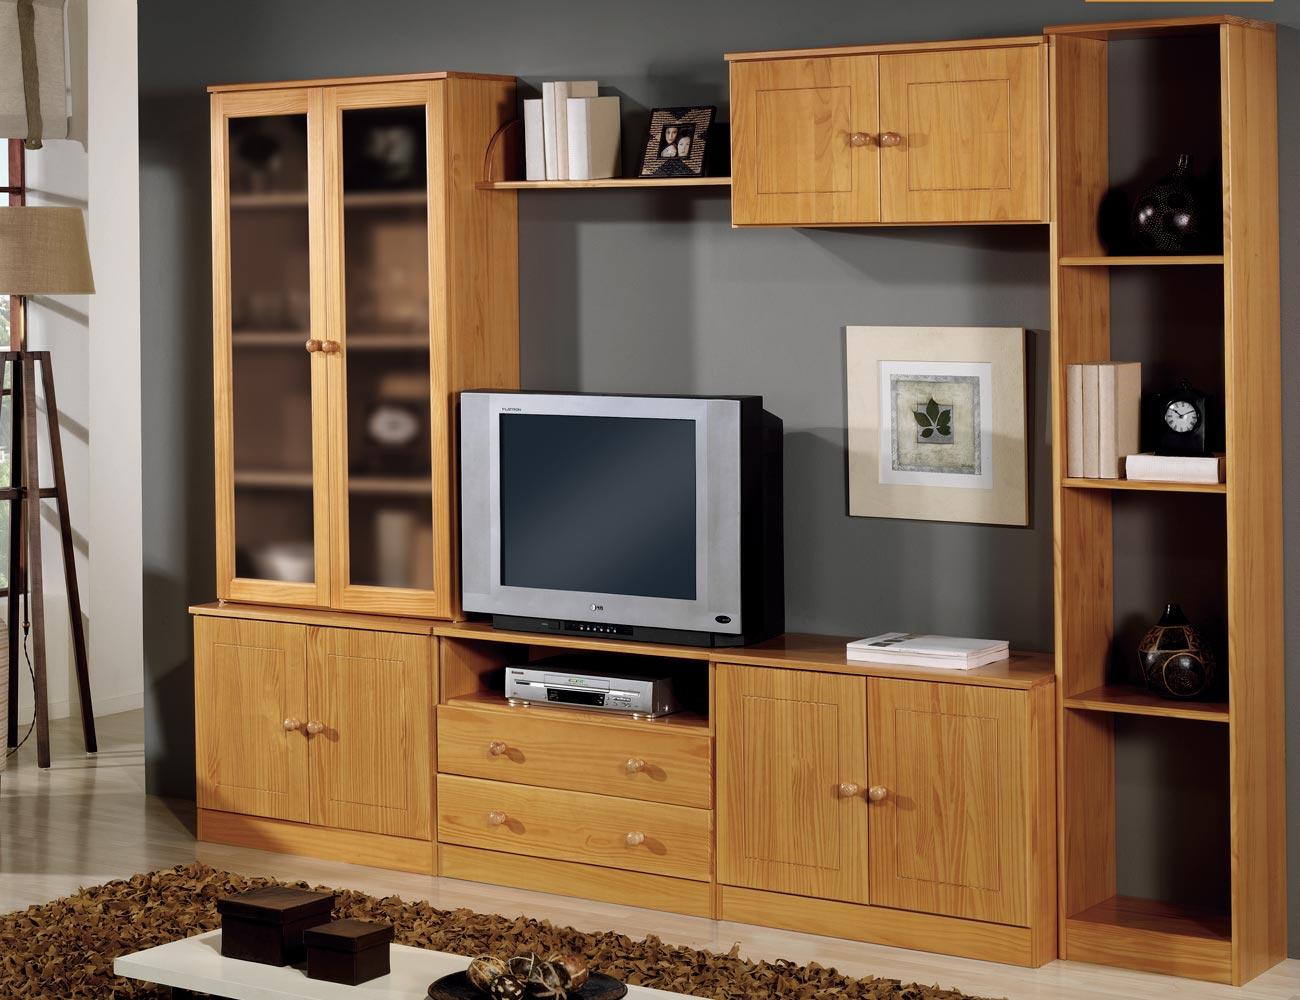 Composicion apilable 2 muebles provenzal madera pino